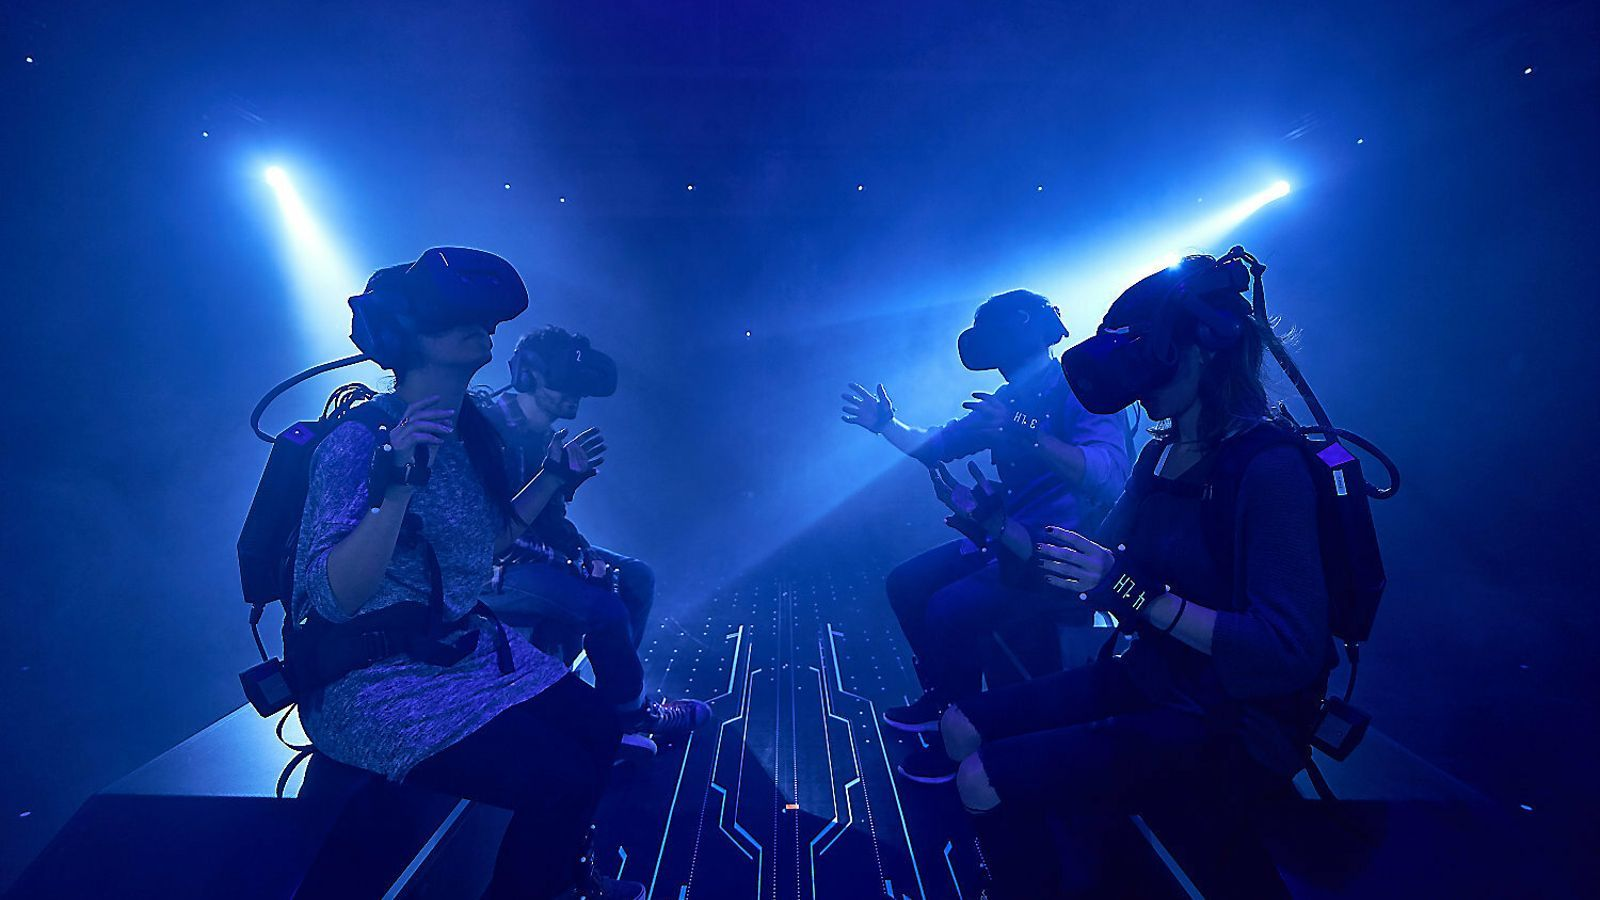 Realitat virtual i 'escape rooms', una aliança immersiva